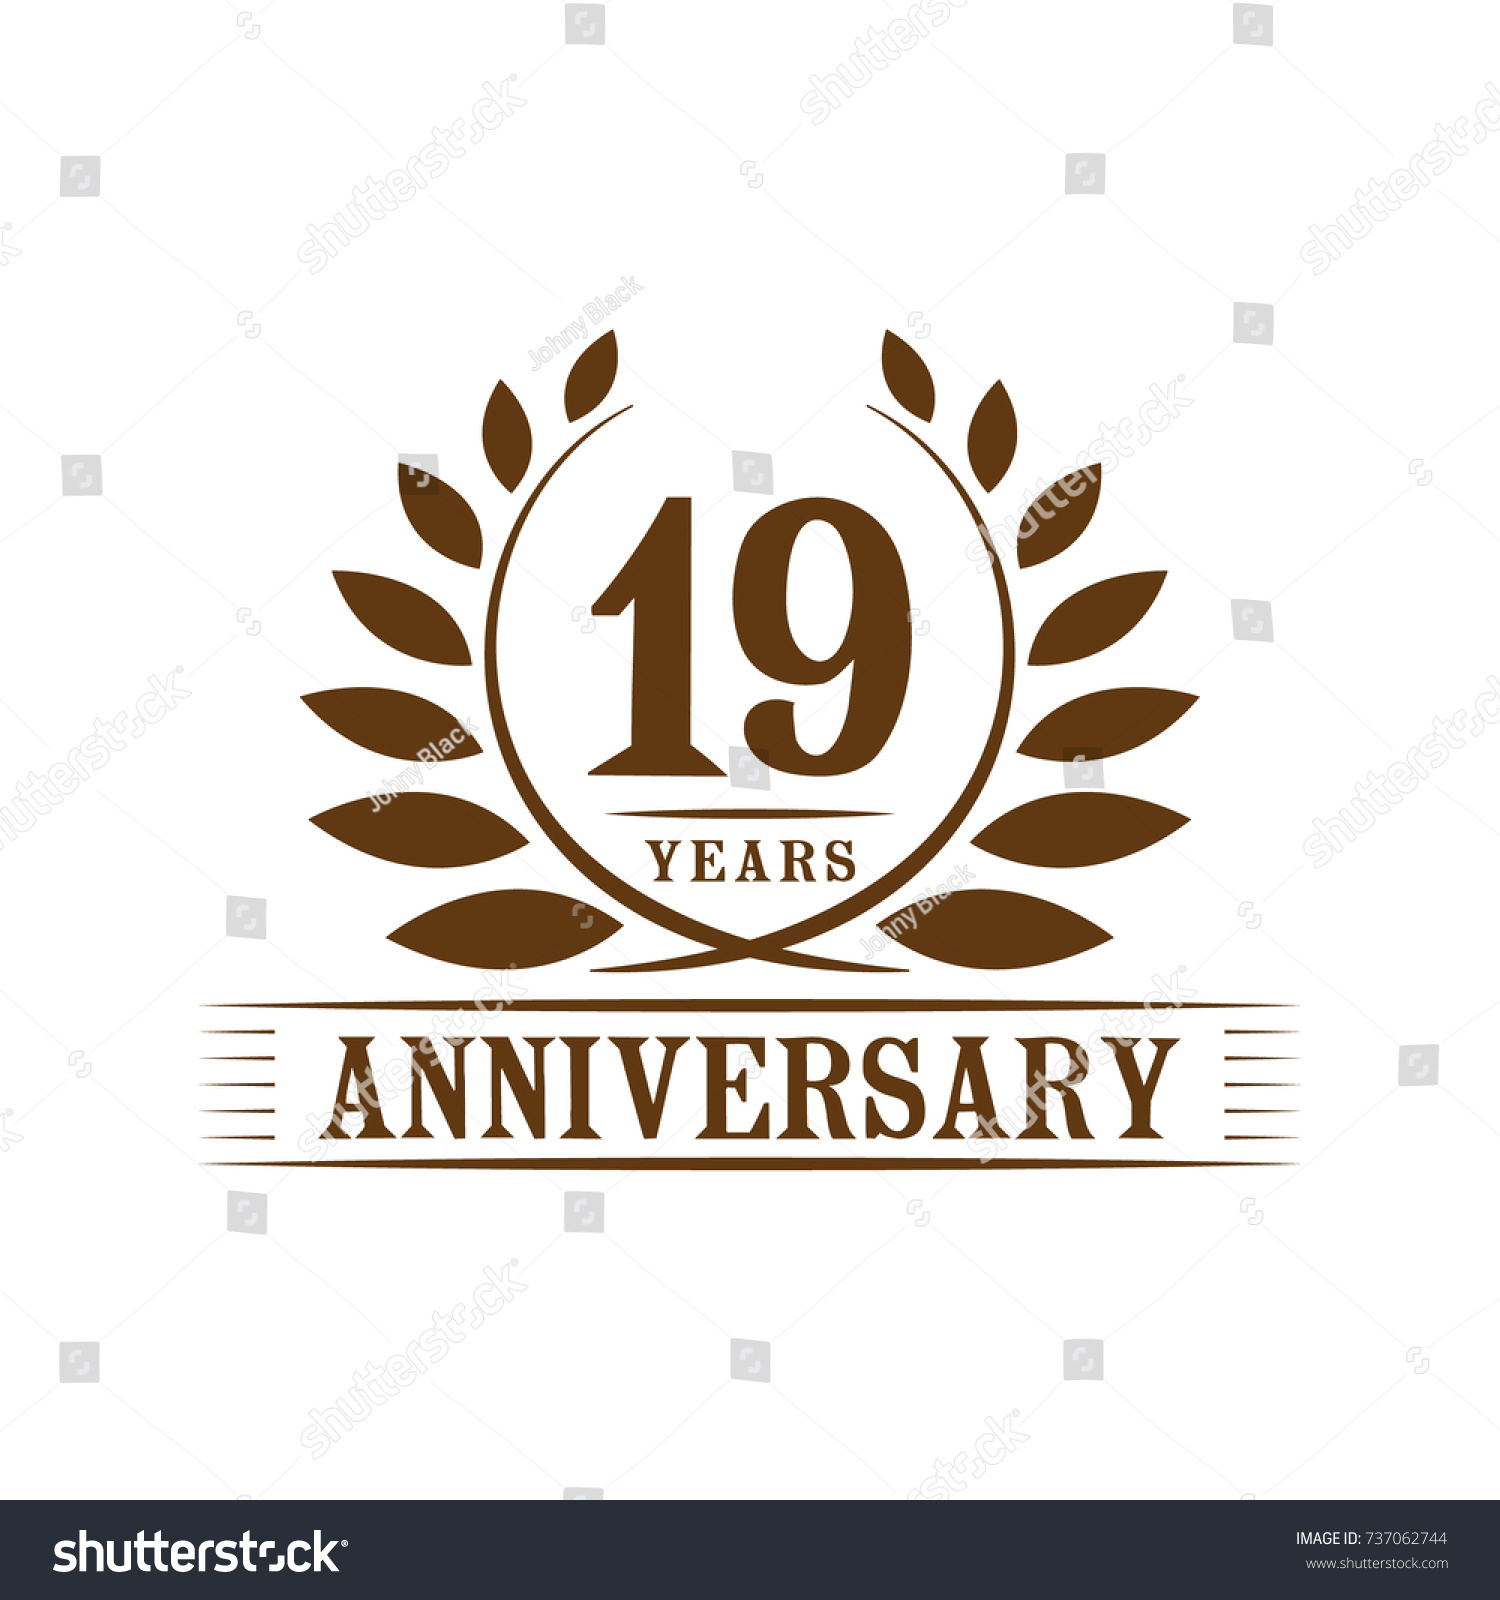 19 years anniversary logo template のベクター画像素材 ロイヤリティ